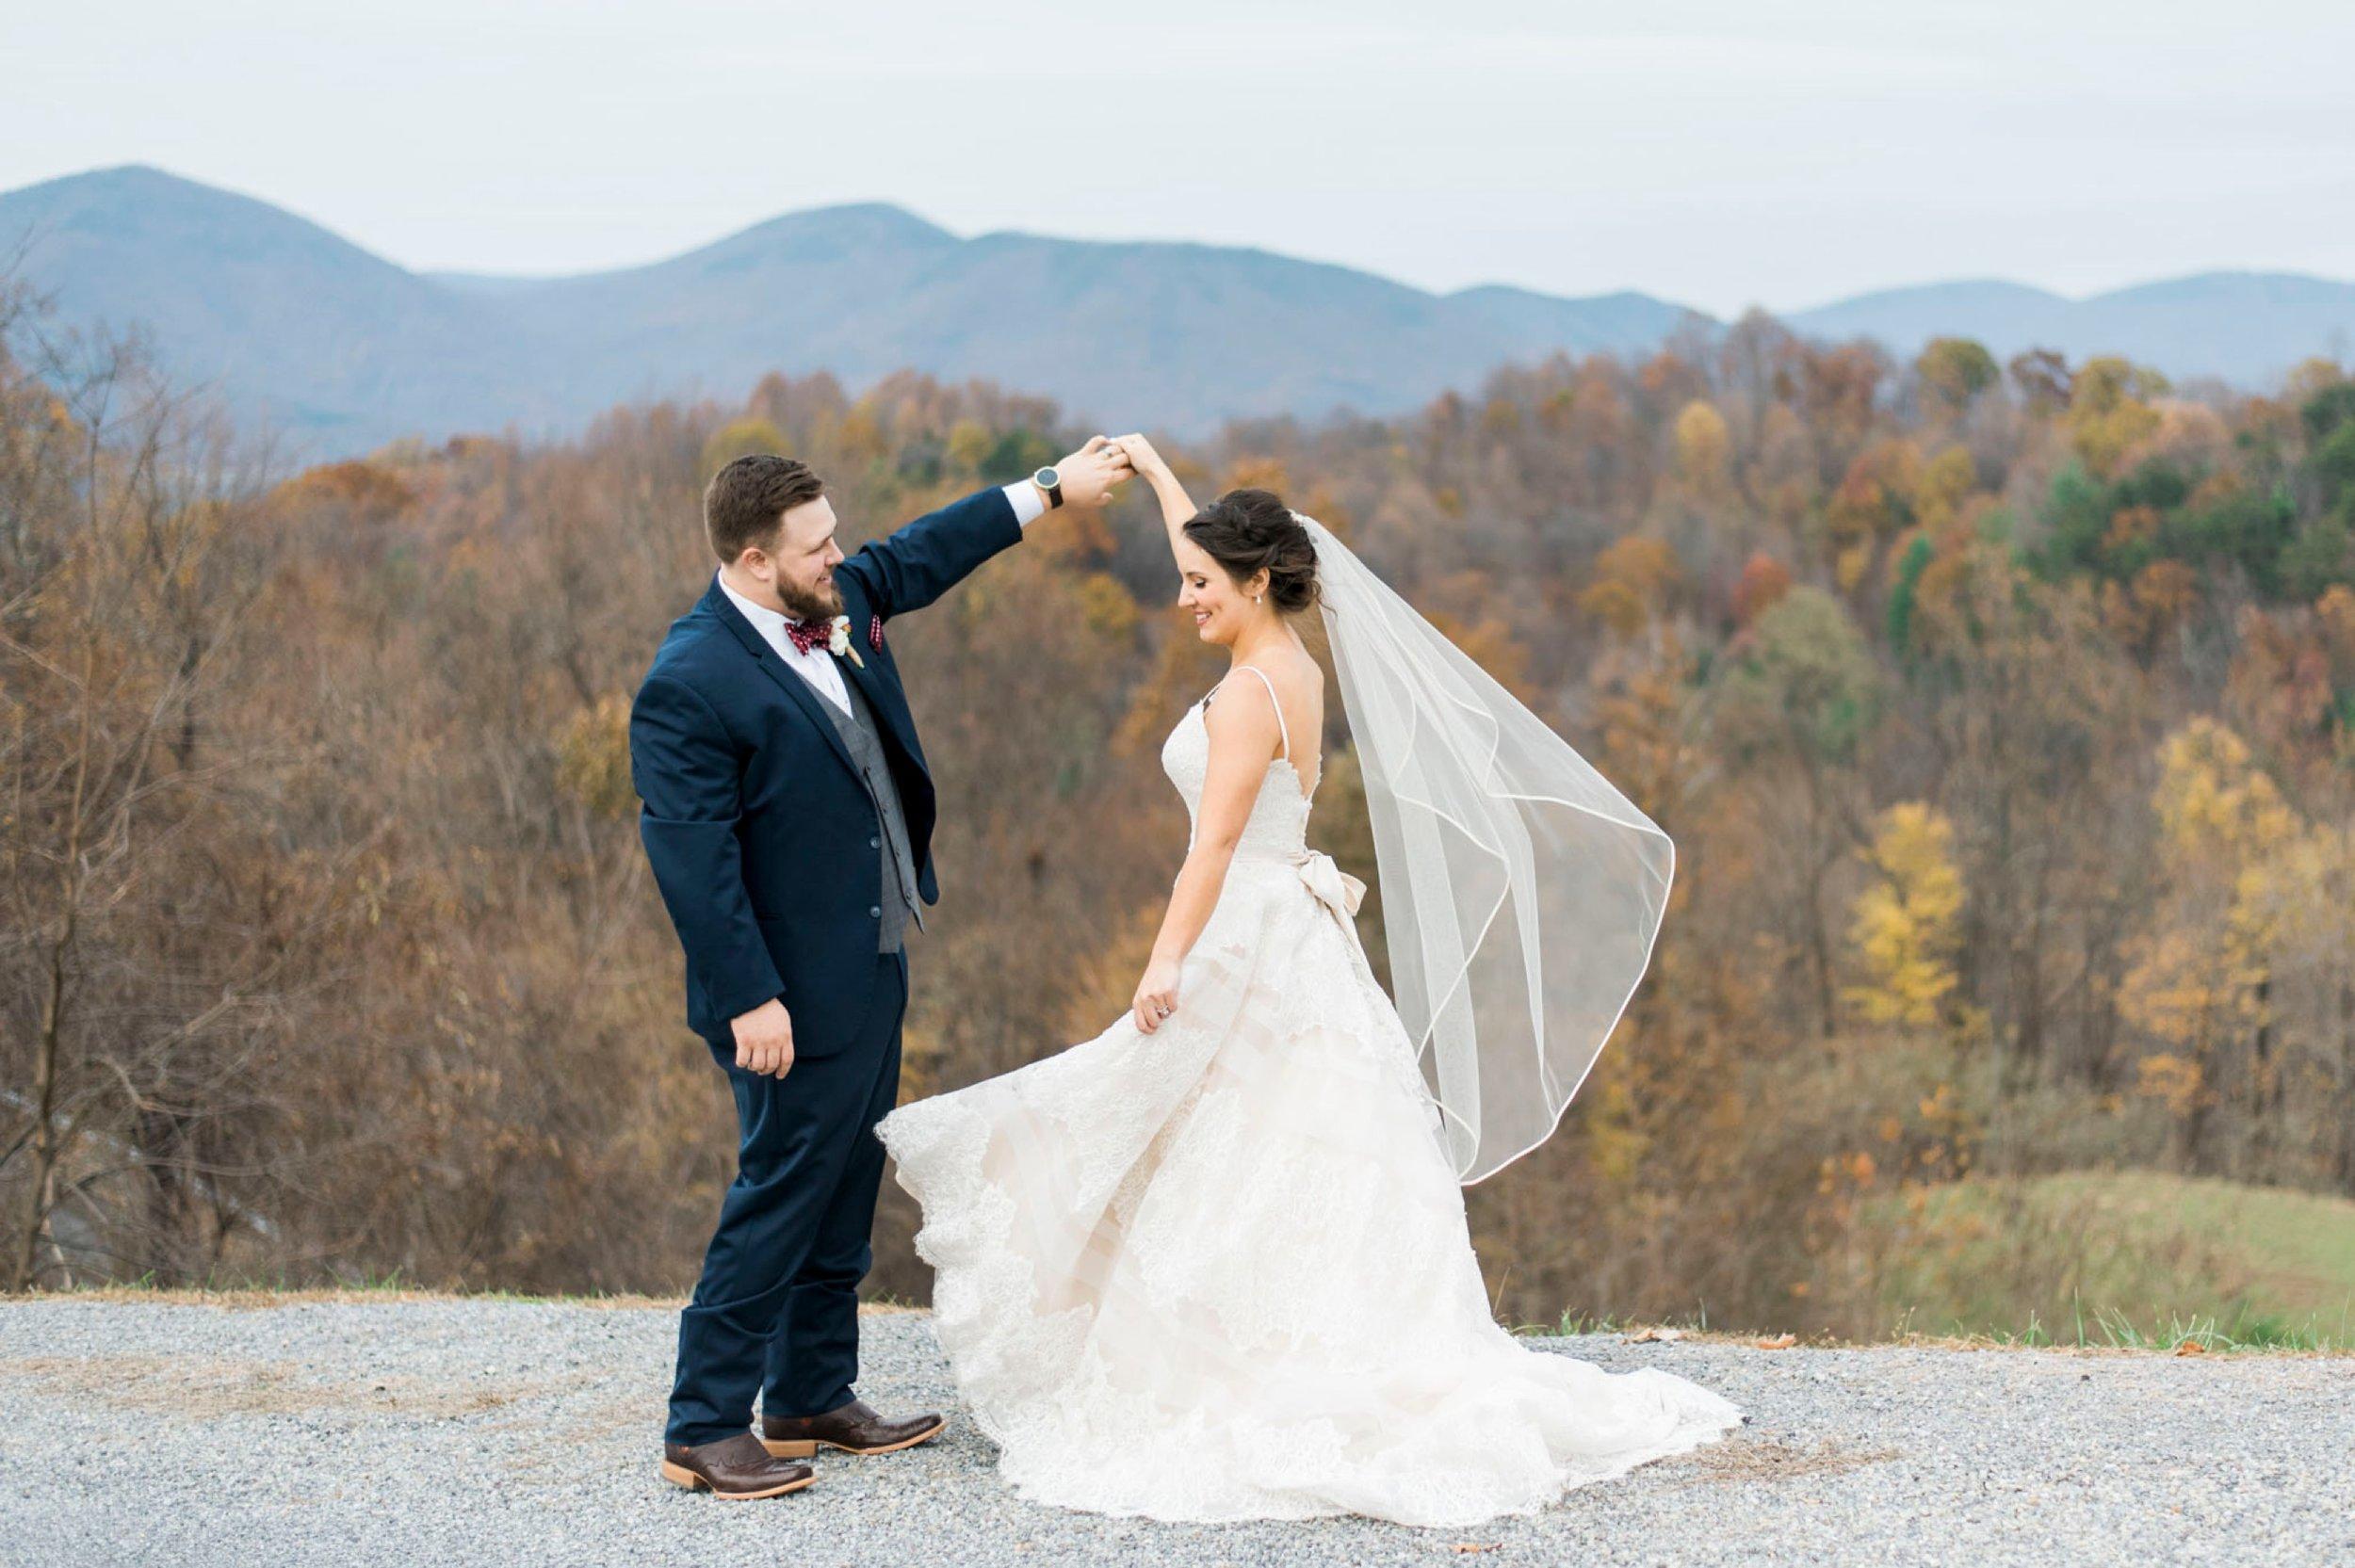 IrvineEstate_LexingtonVA_Wedding_FallWedding_VirginiaWeddingPhotographer 82.jpg